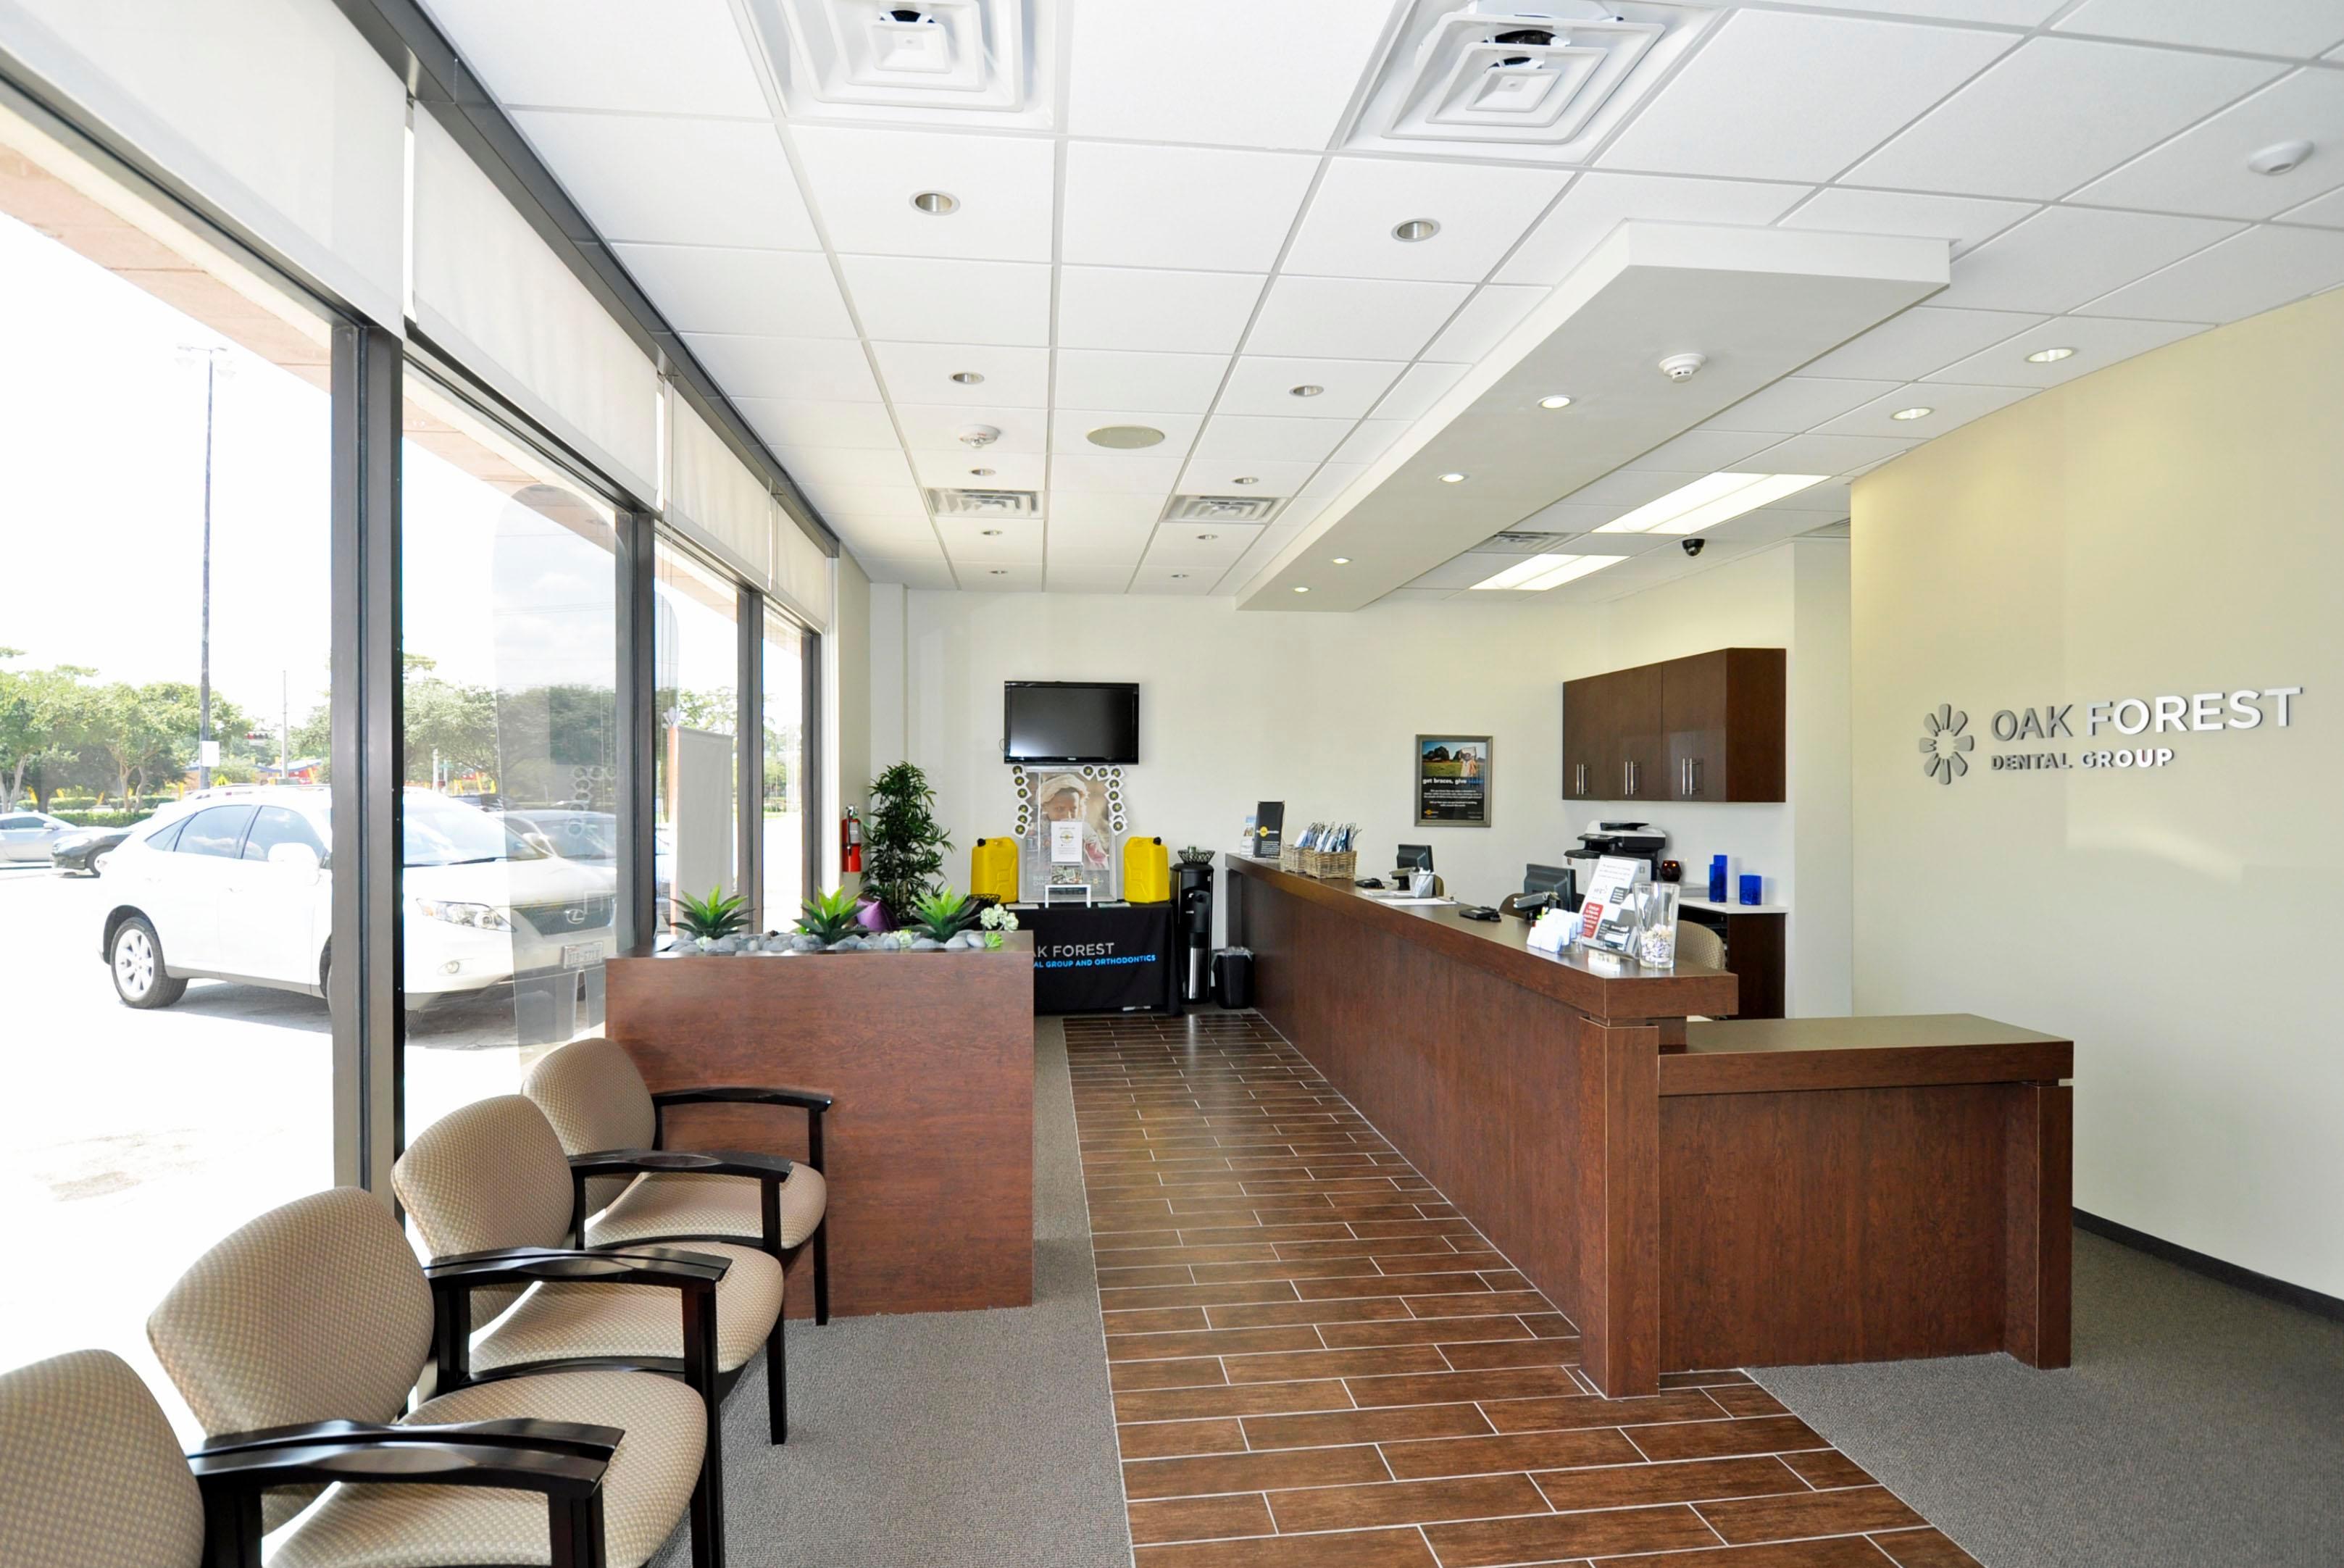 Oak Forest Dental Group and Orthodontics image 6